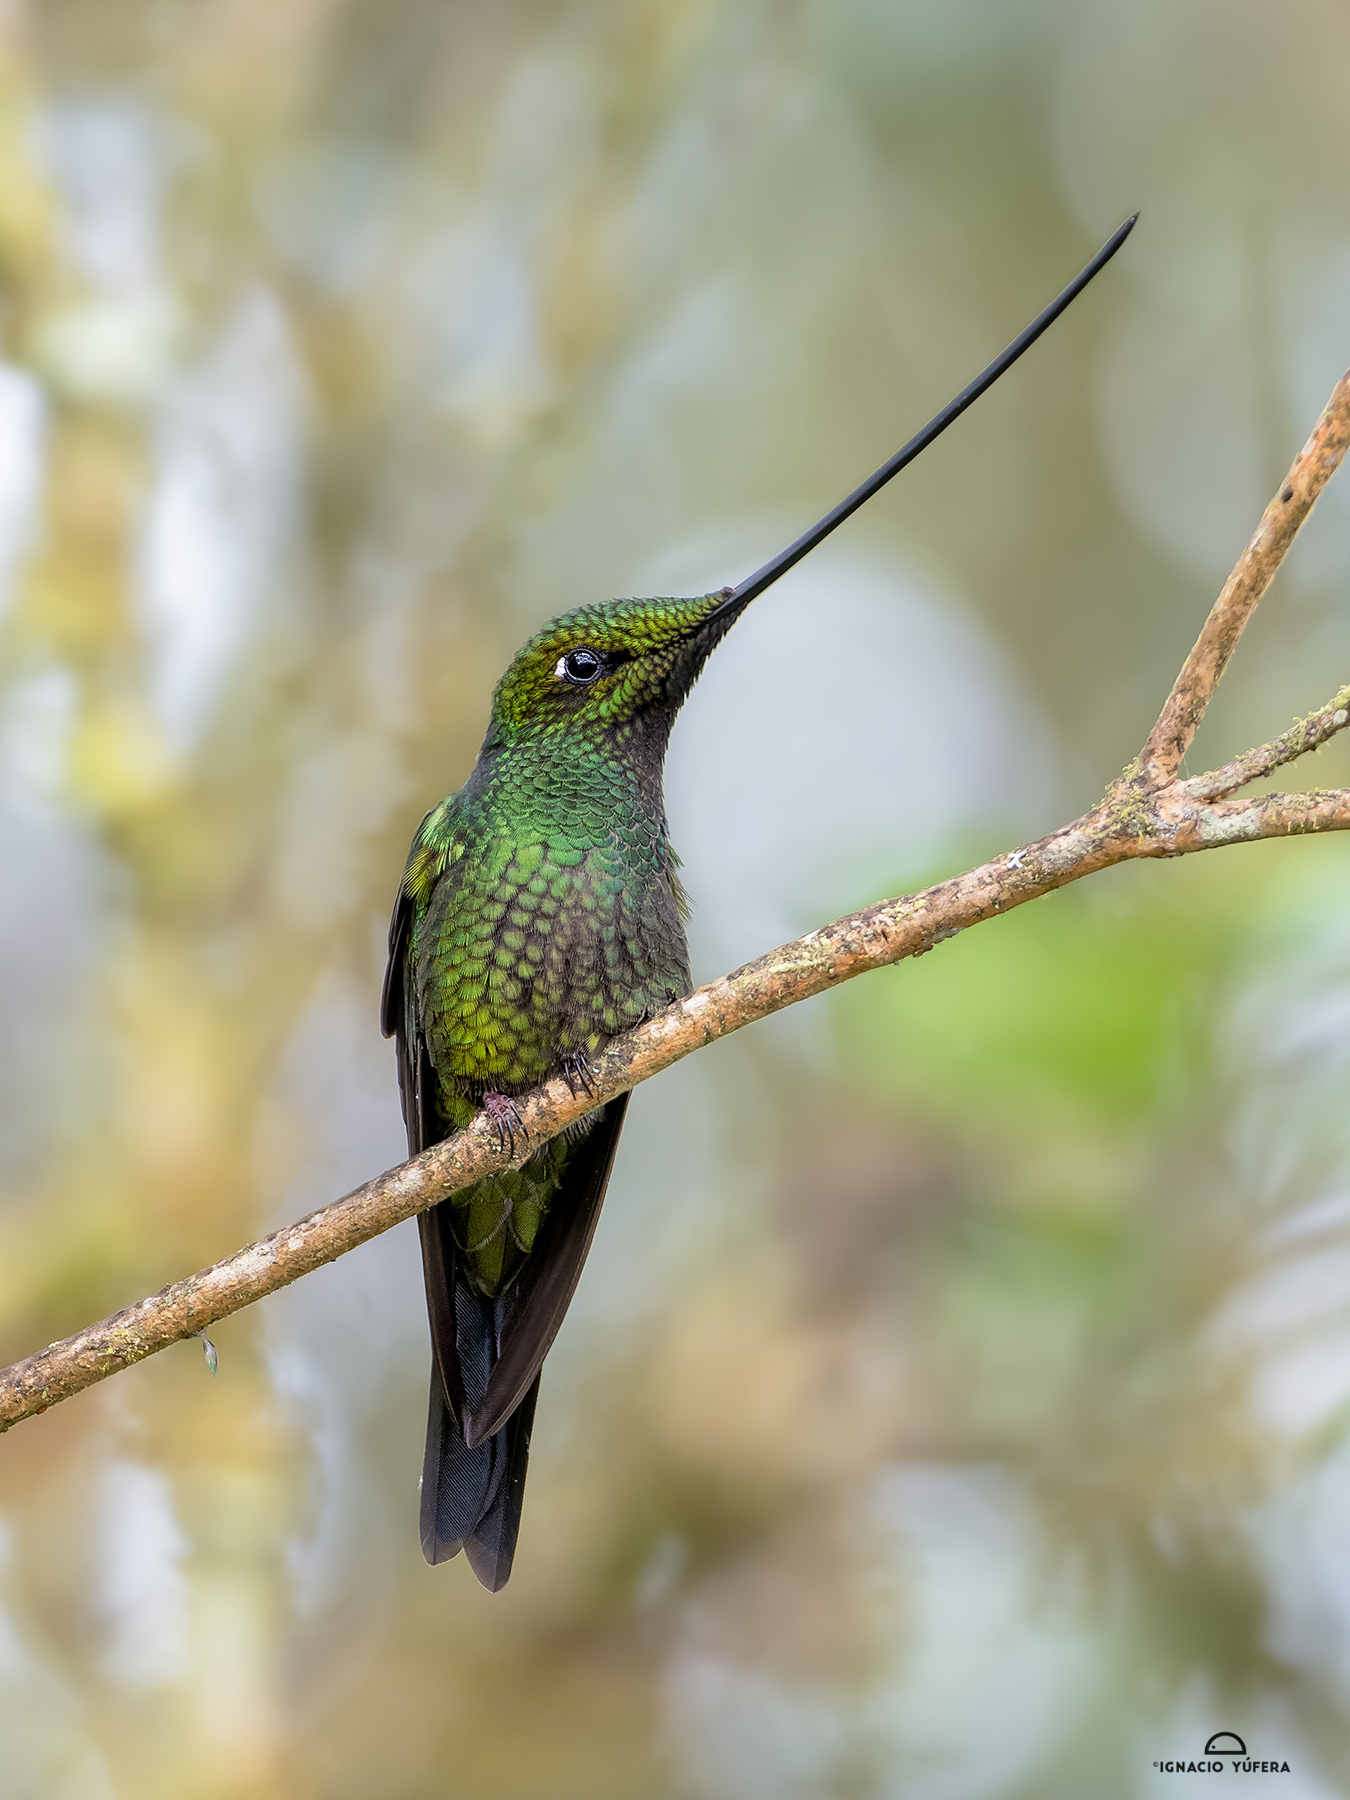 Sword-billed Hummingbird (Ensifera ensifera), Abra Patricia, Peru